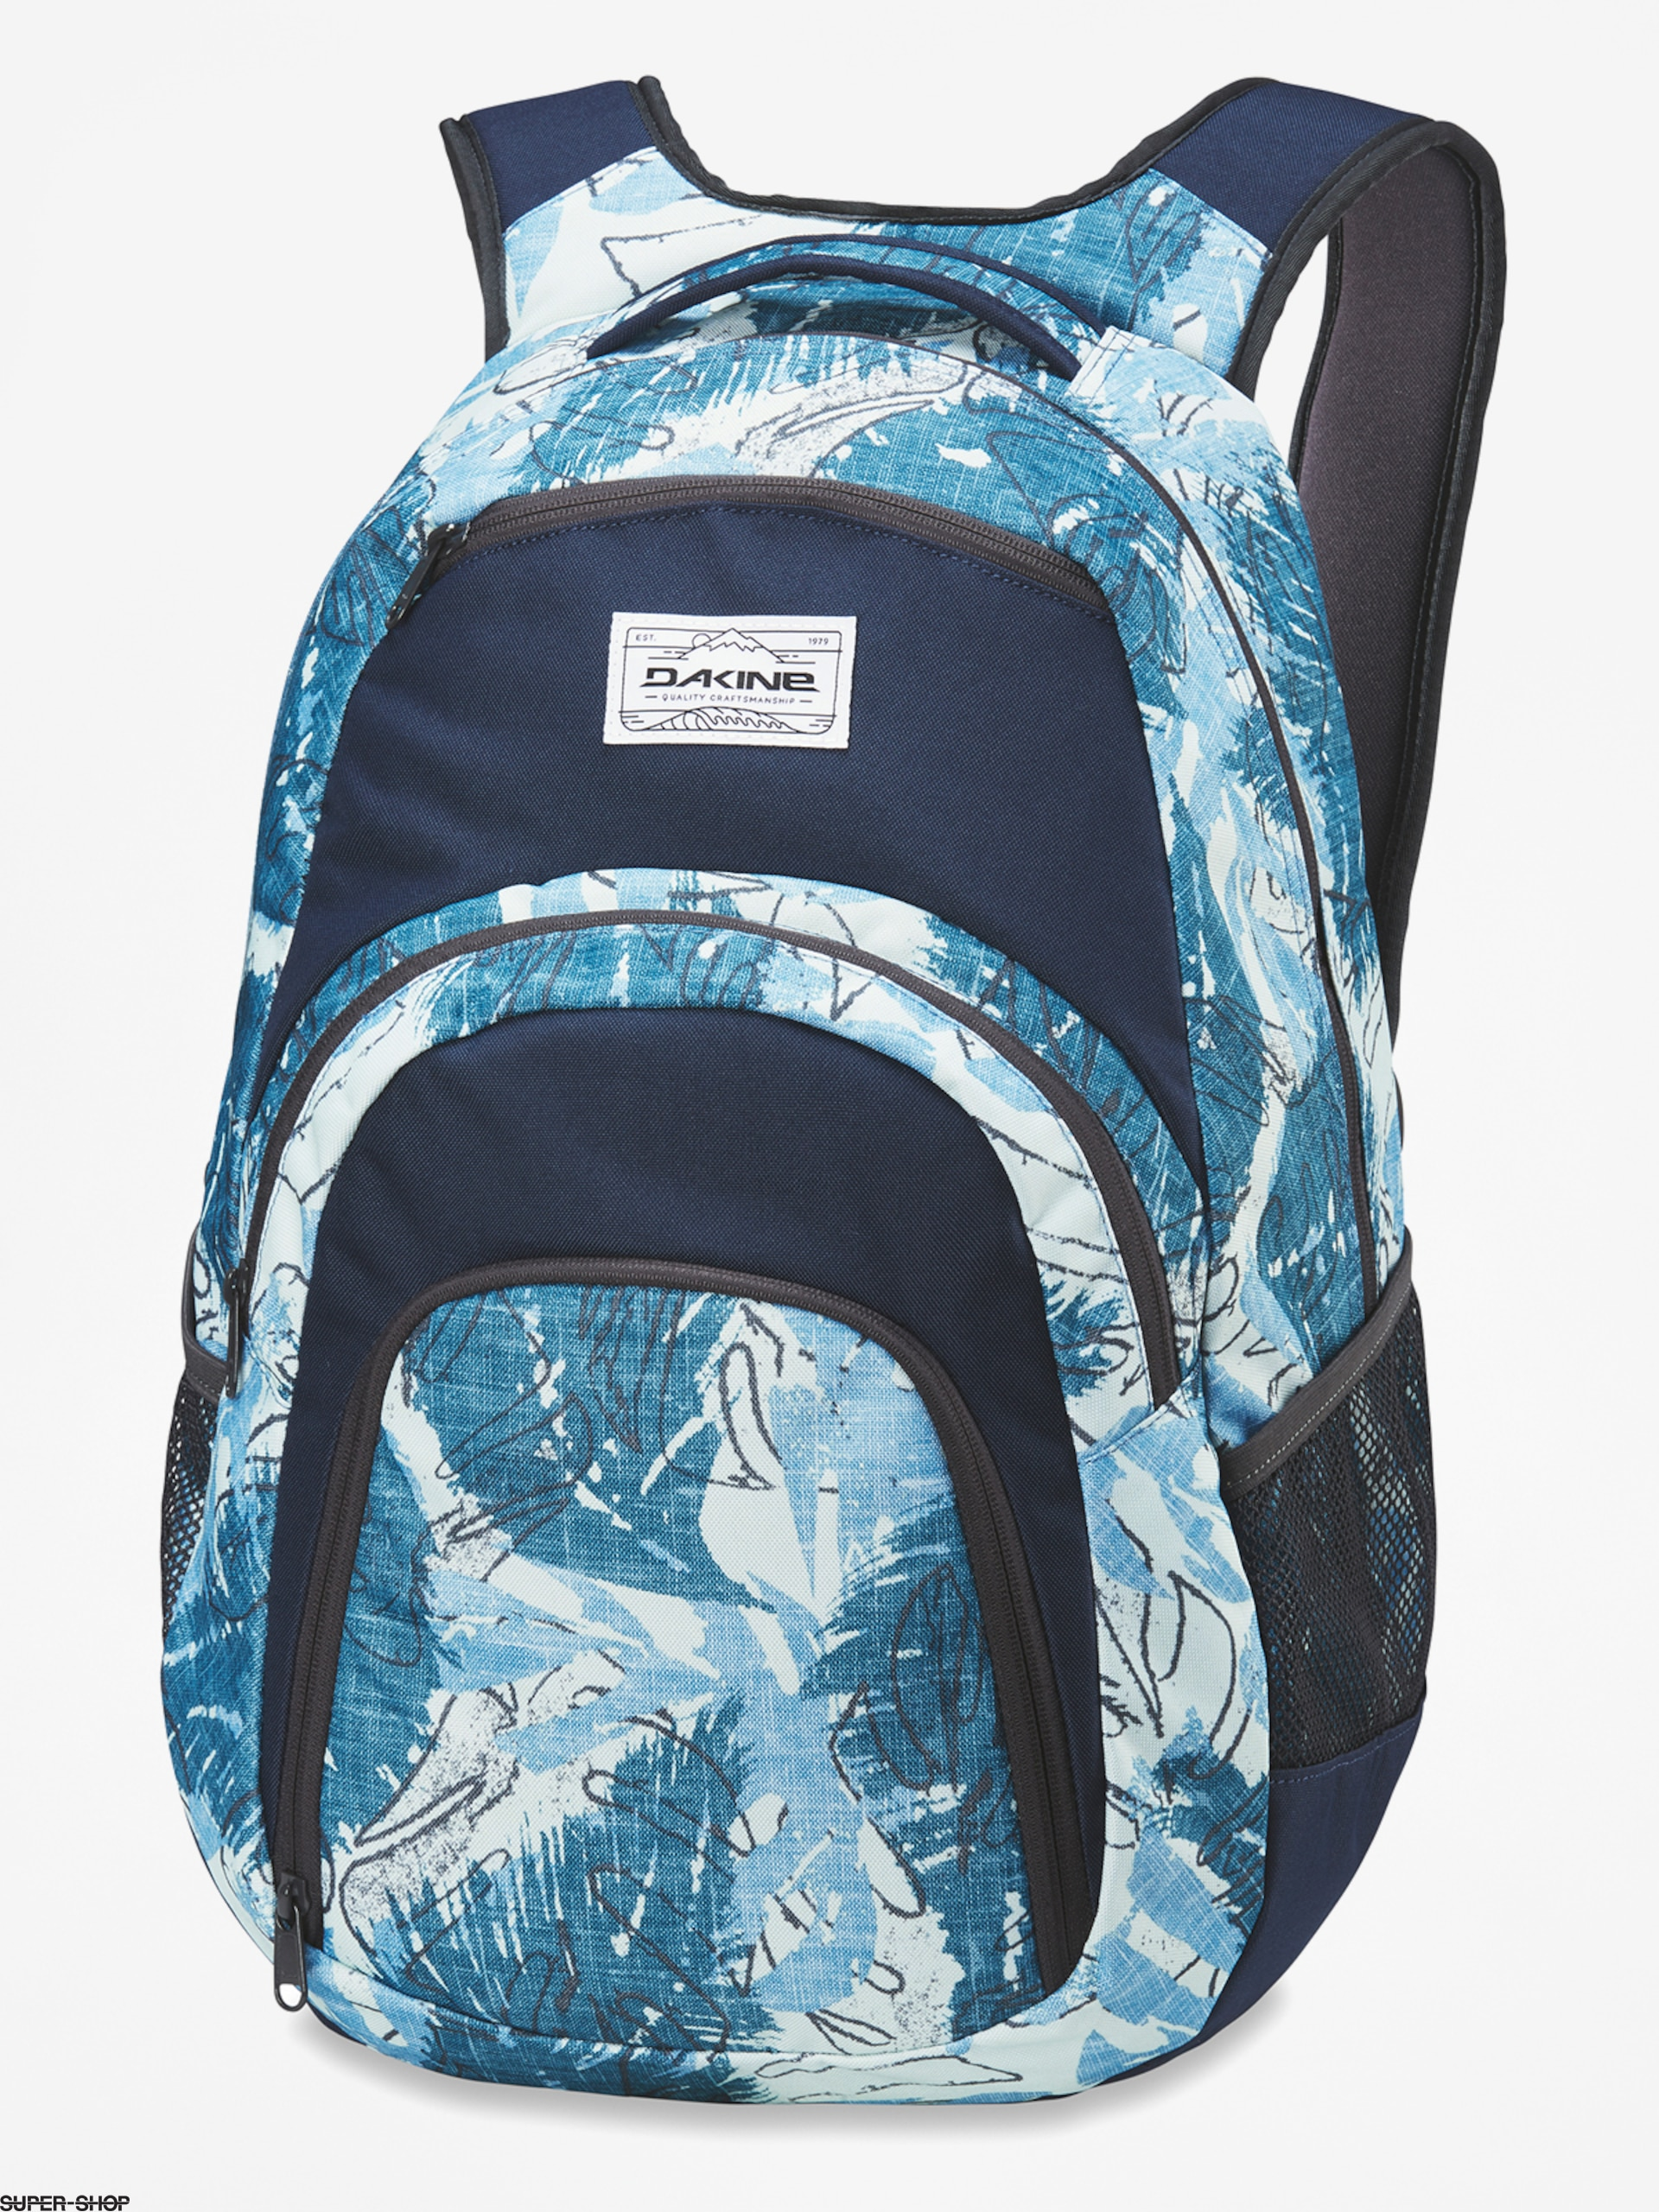 042802c339f 923152-w1920-dakine-backpack-campus-33l-washed-palm.jpg